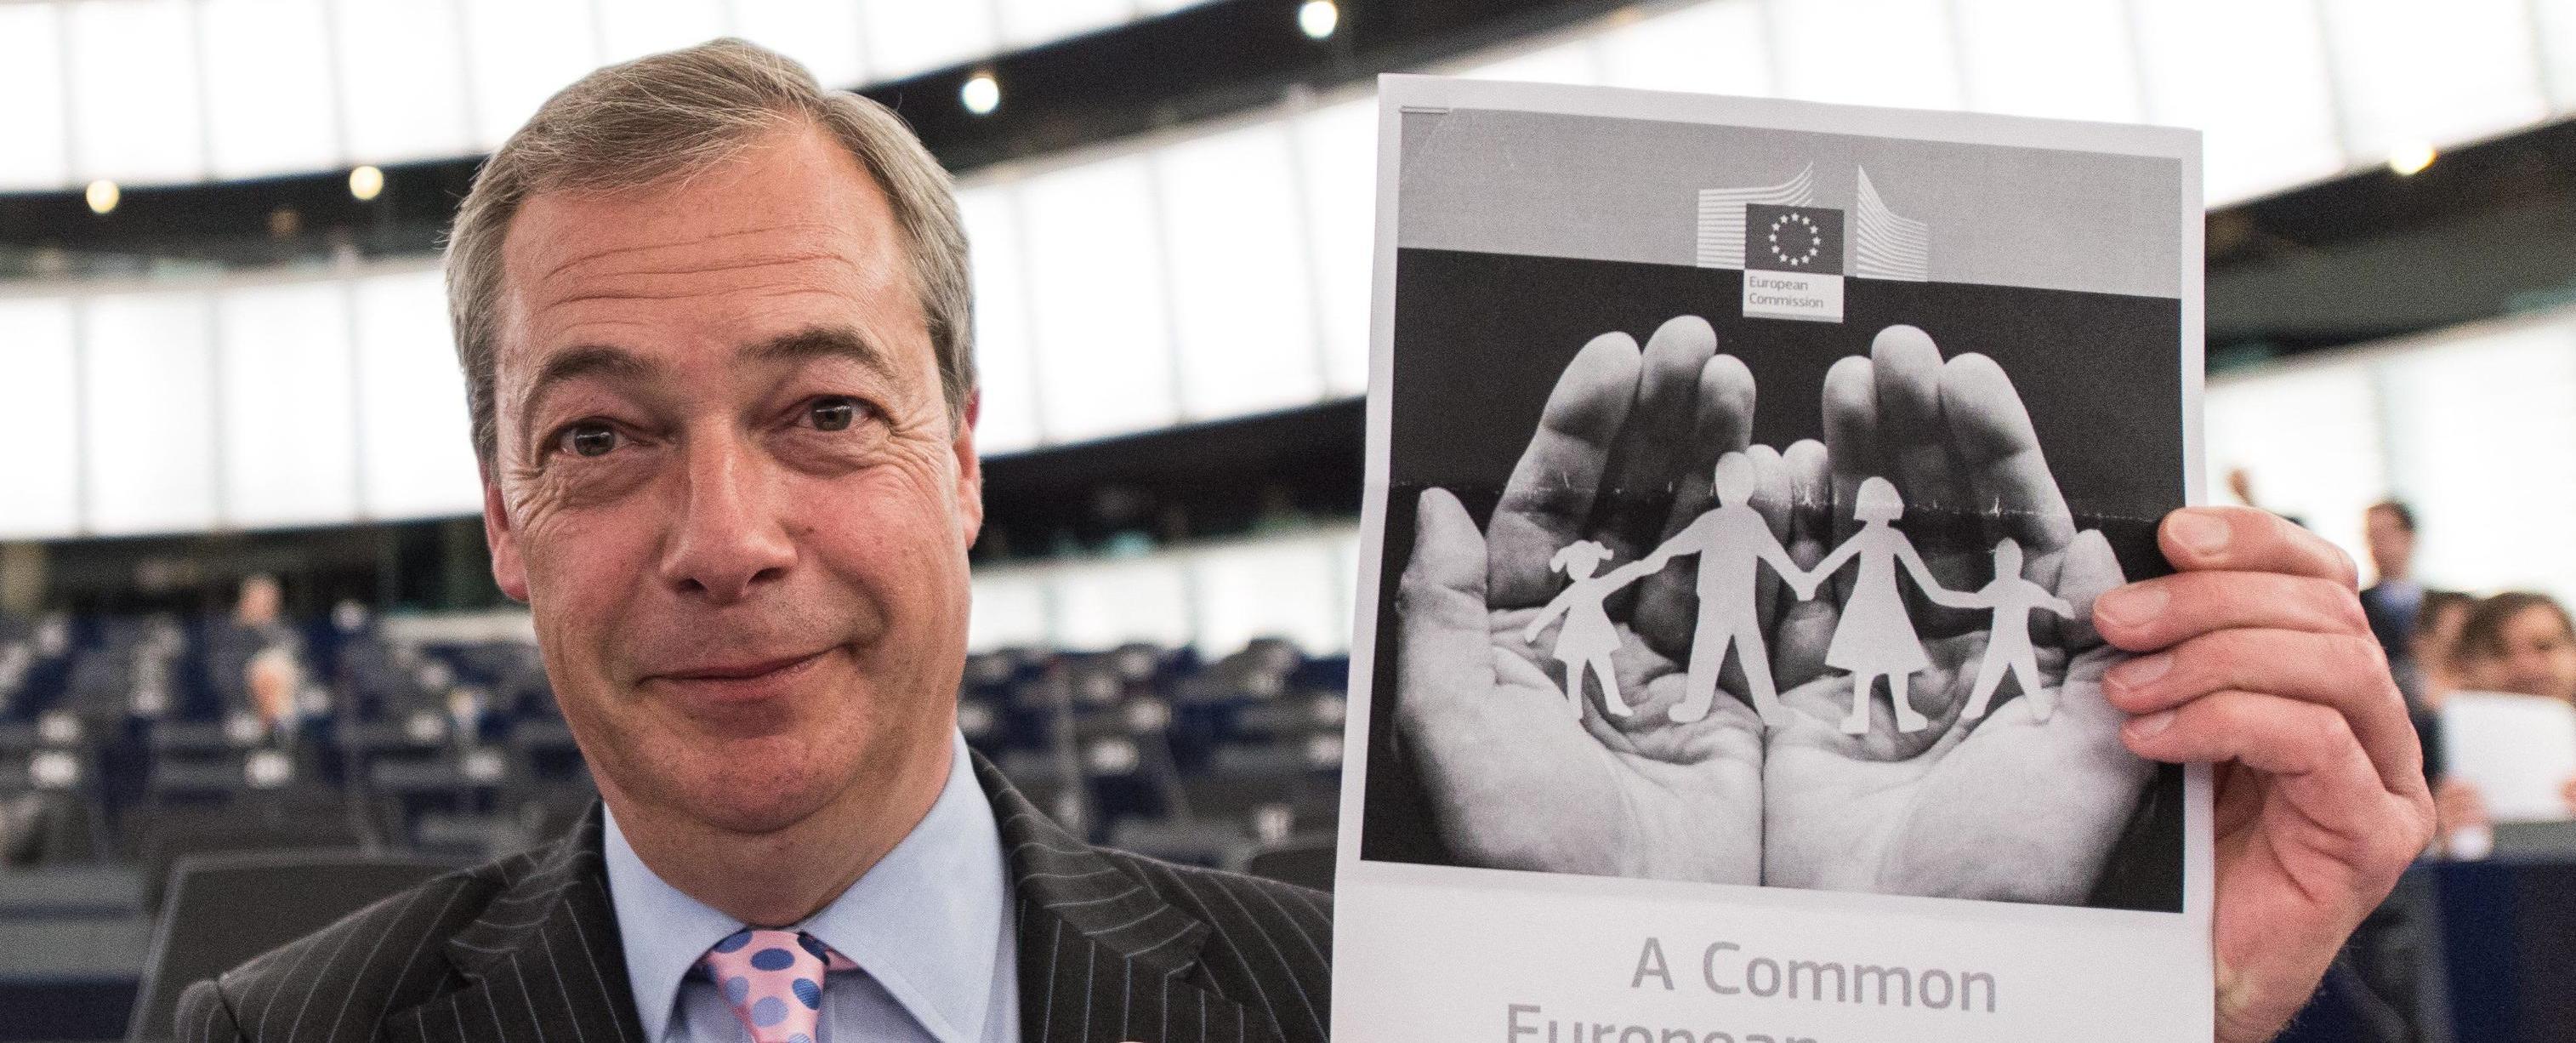 Il leader dell'Ukip Nigel Farage